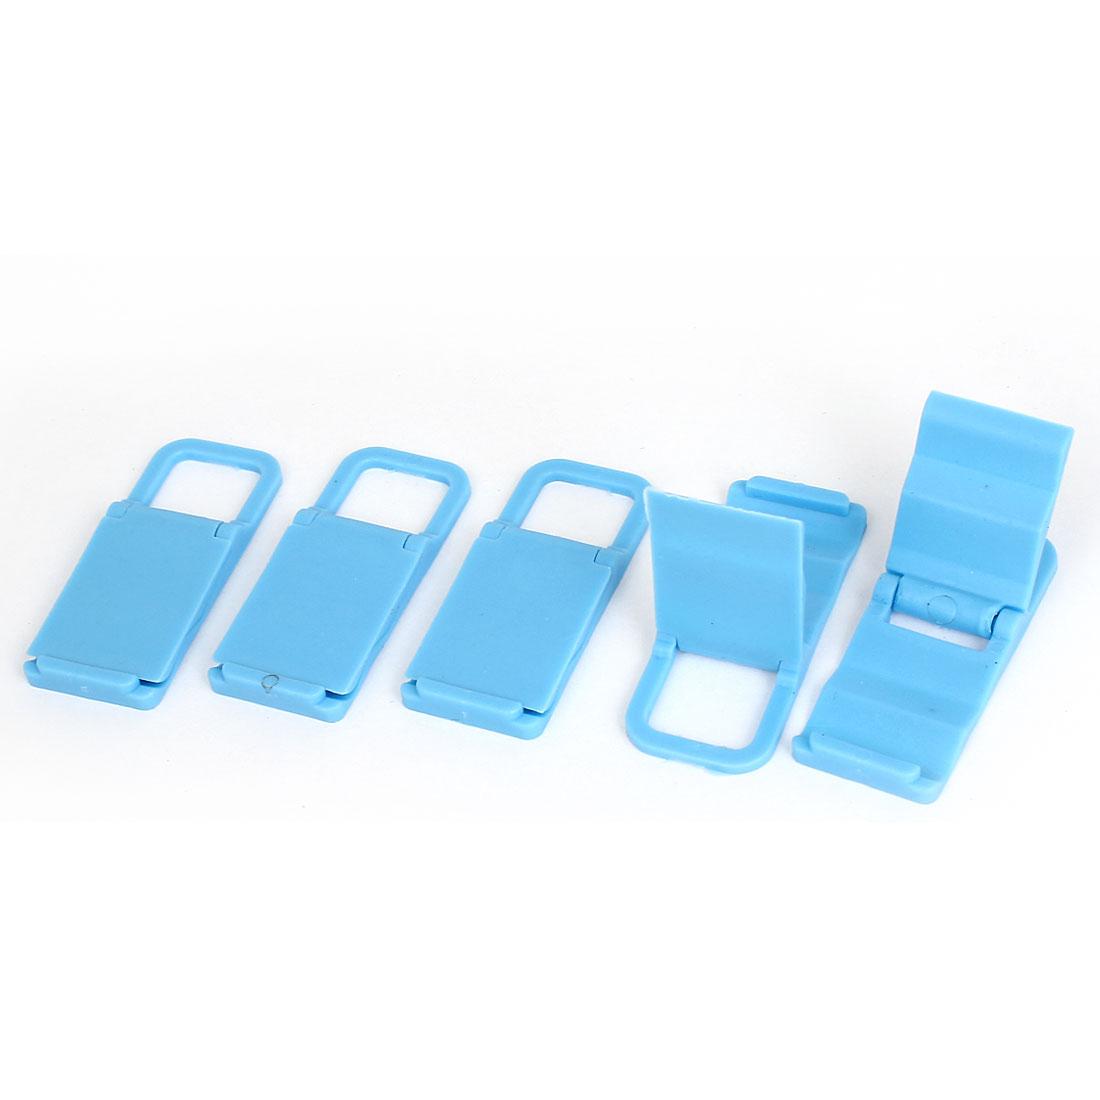 5pcs Desktop Foldable Chair Universal Mobile Phone Holder Stand Bracket Blue